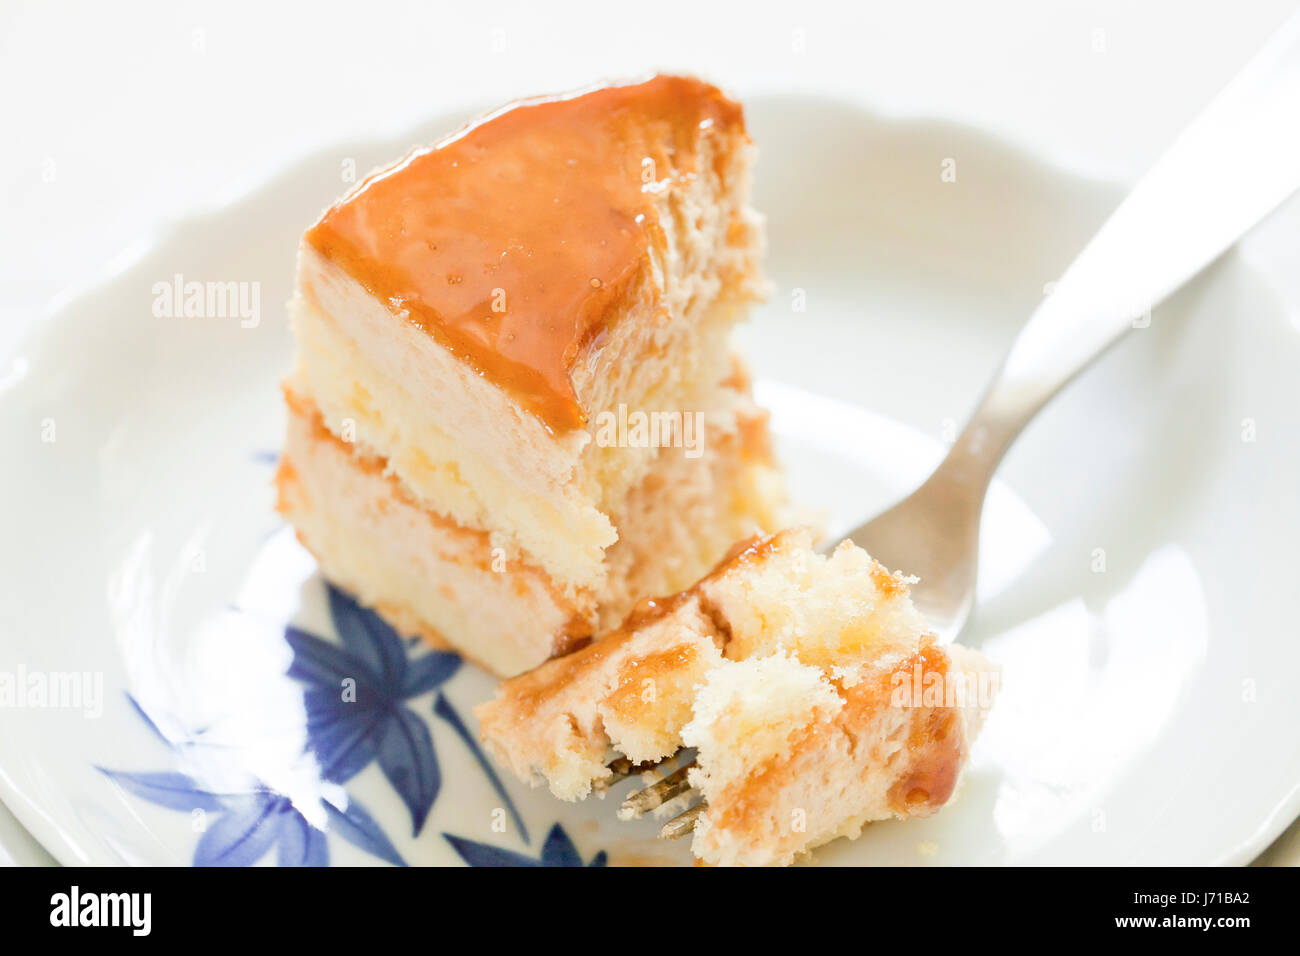 Half-eaten slice of layered cheesecake on dish - USA - Stock Image